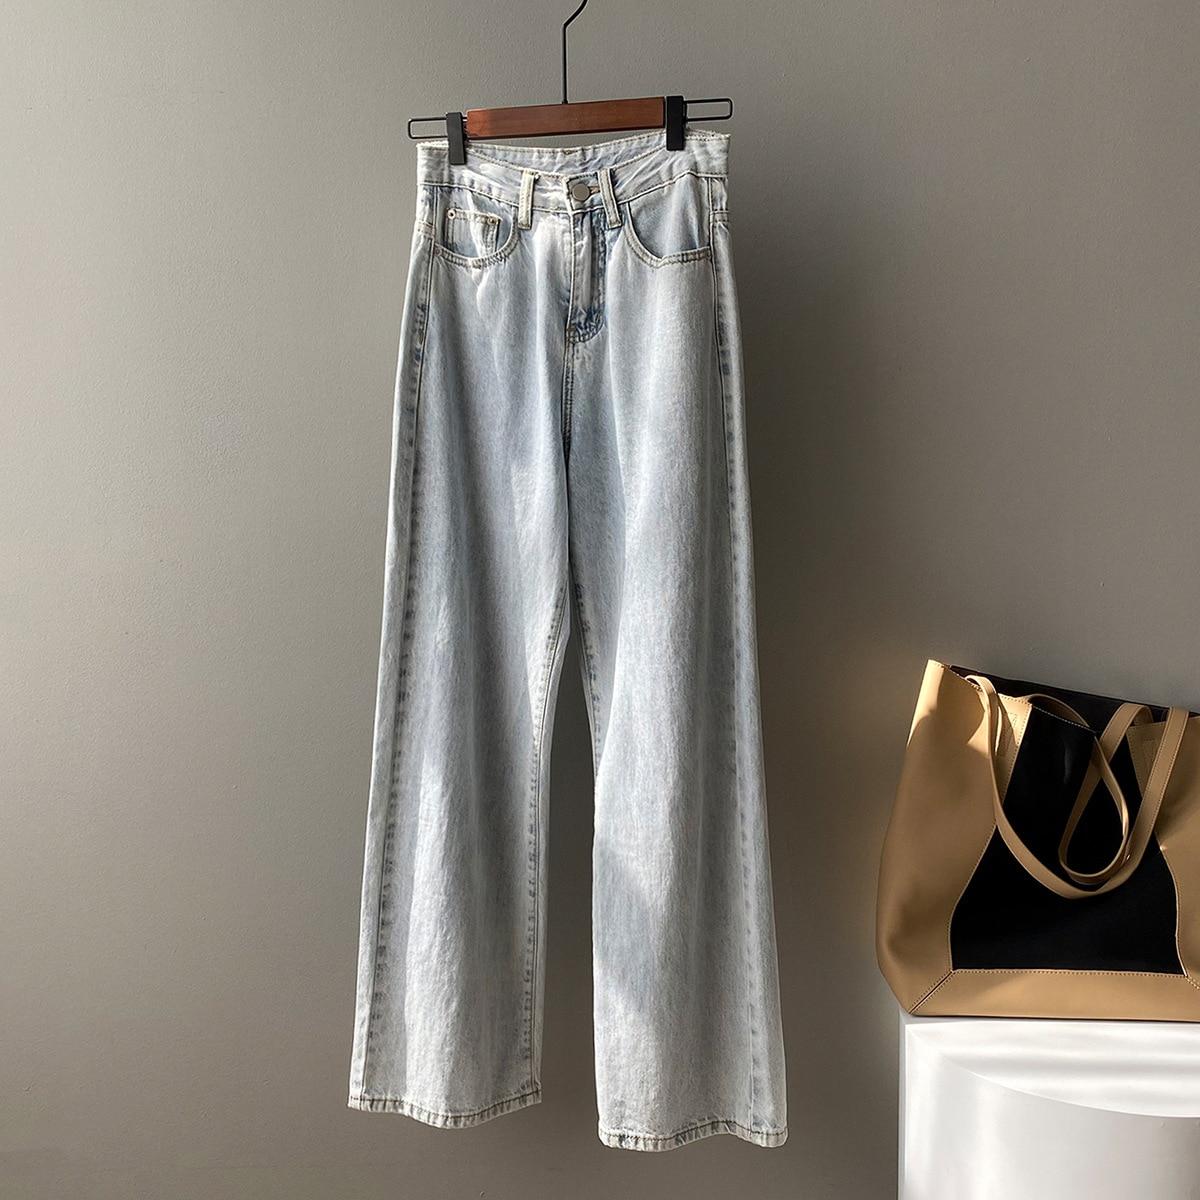 CMAZ Streetwear High Waist Women's Fashion Jeans Wide Leg Vintage Loose Pants Trousers Fashion Femal